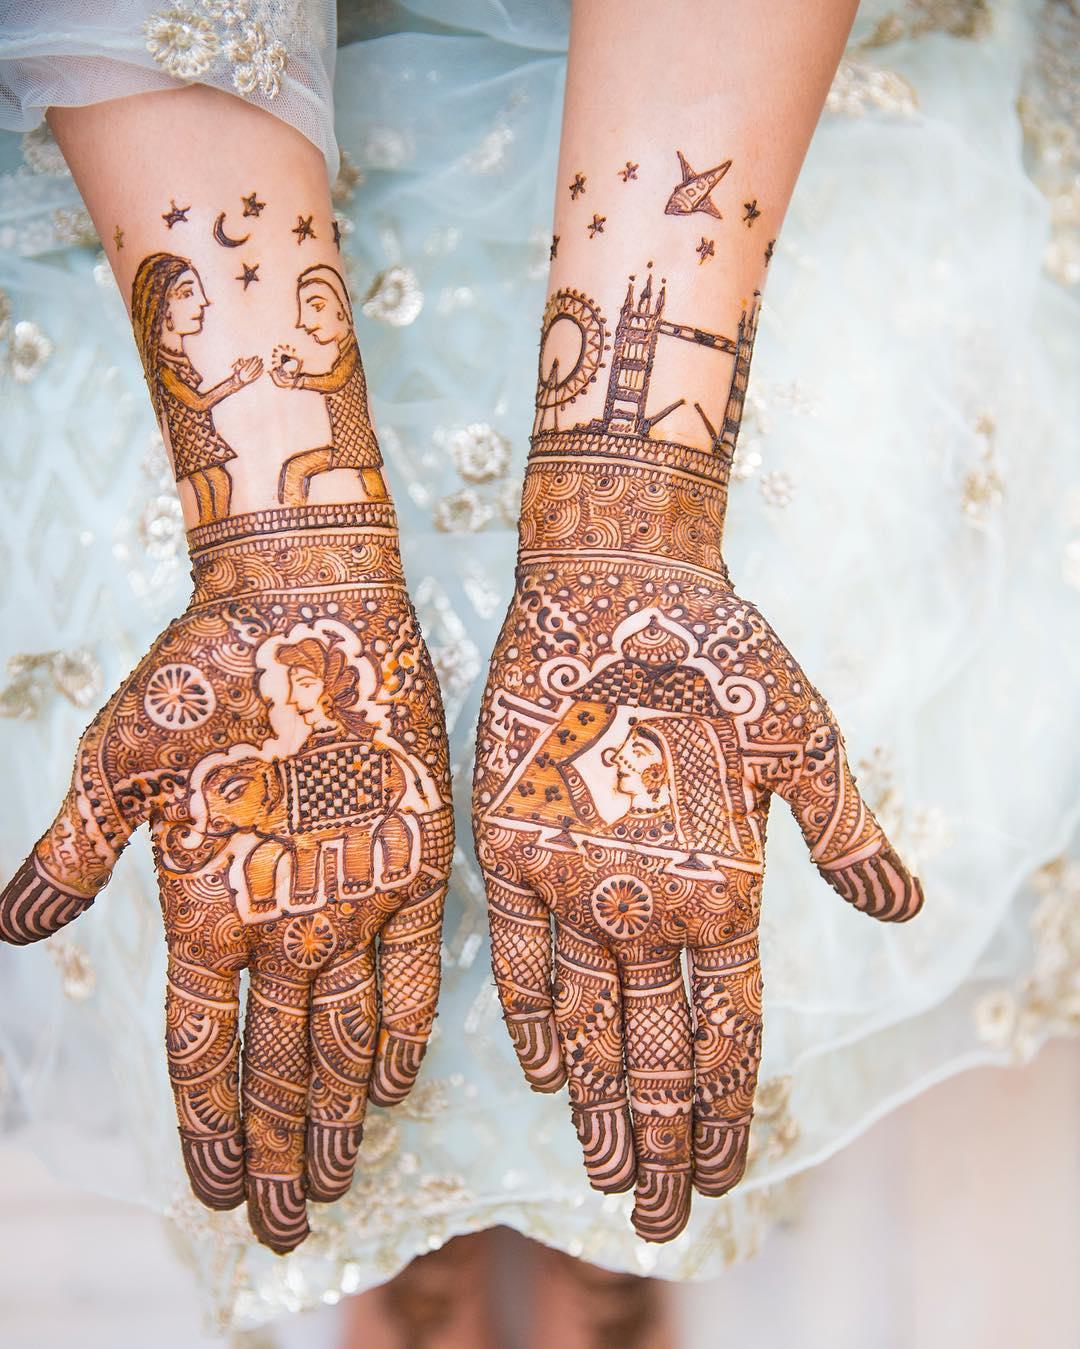 unique mehendi designs, beautiful bridal mehendi, wedding photographer, the wedding crasher official